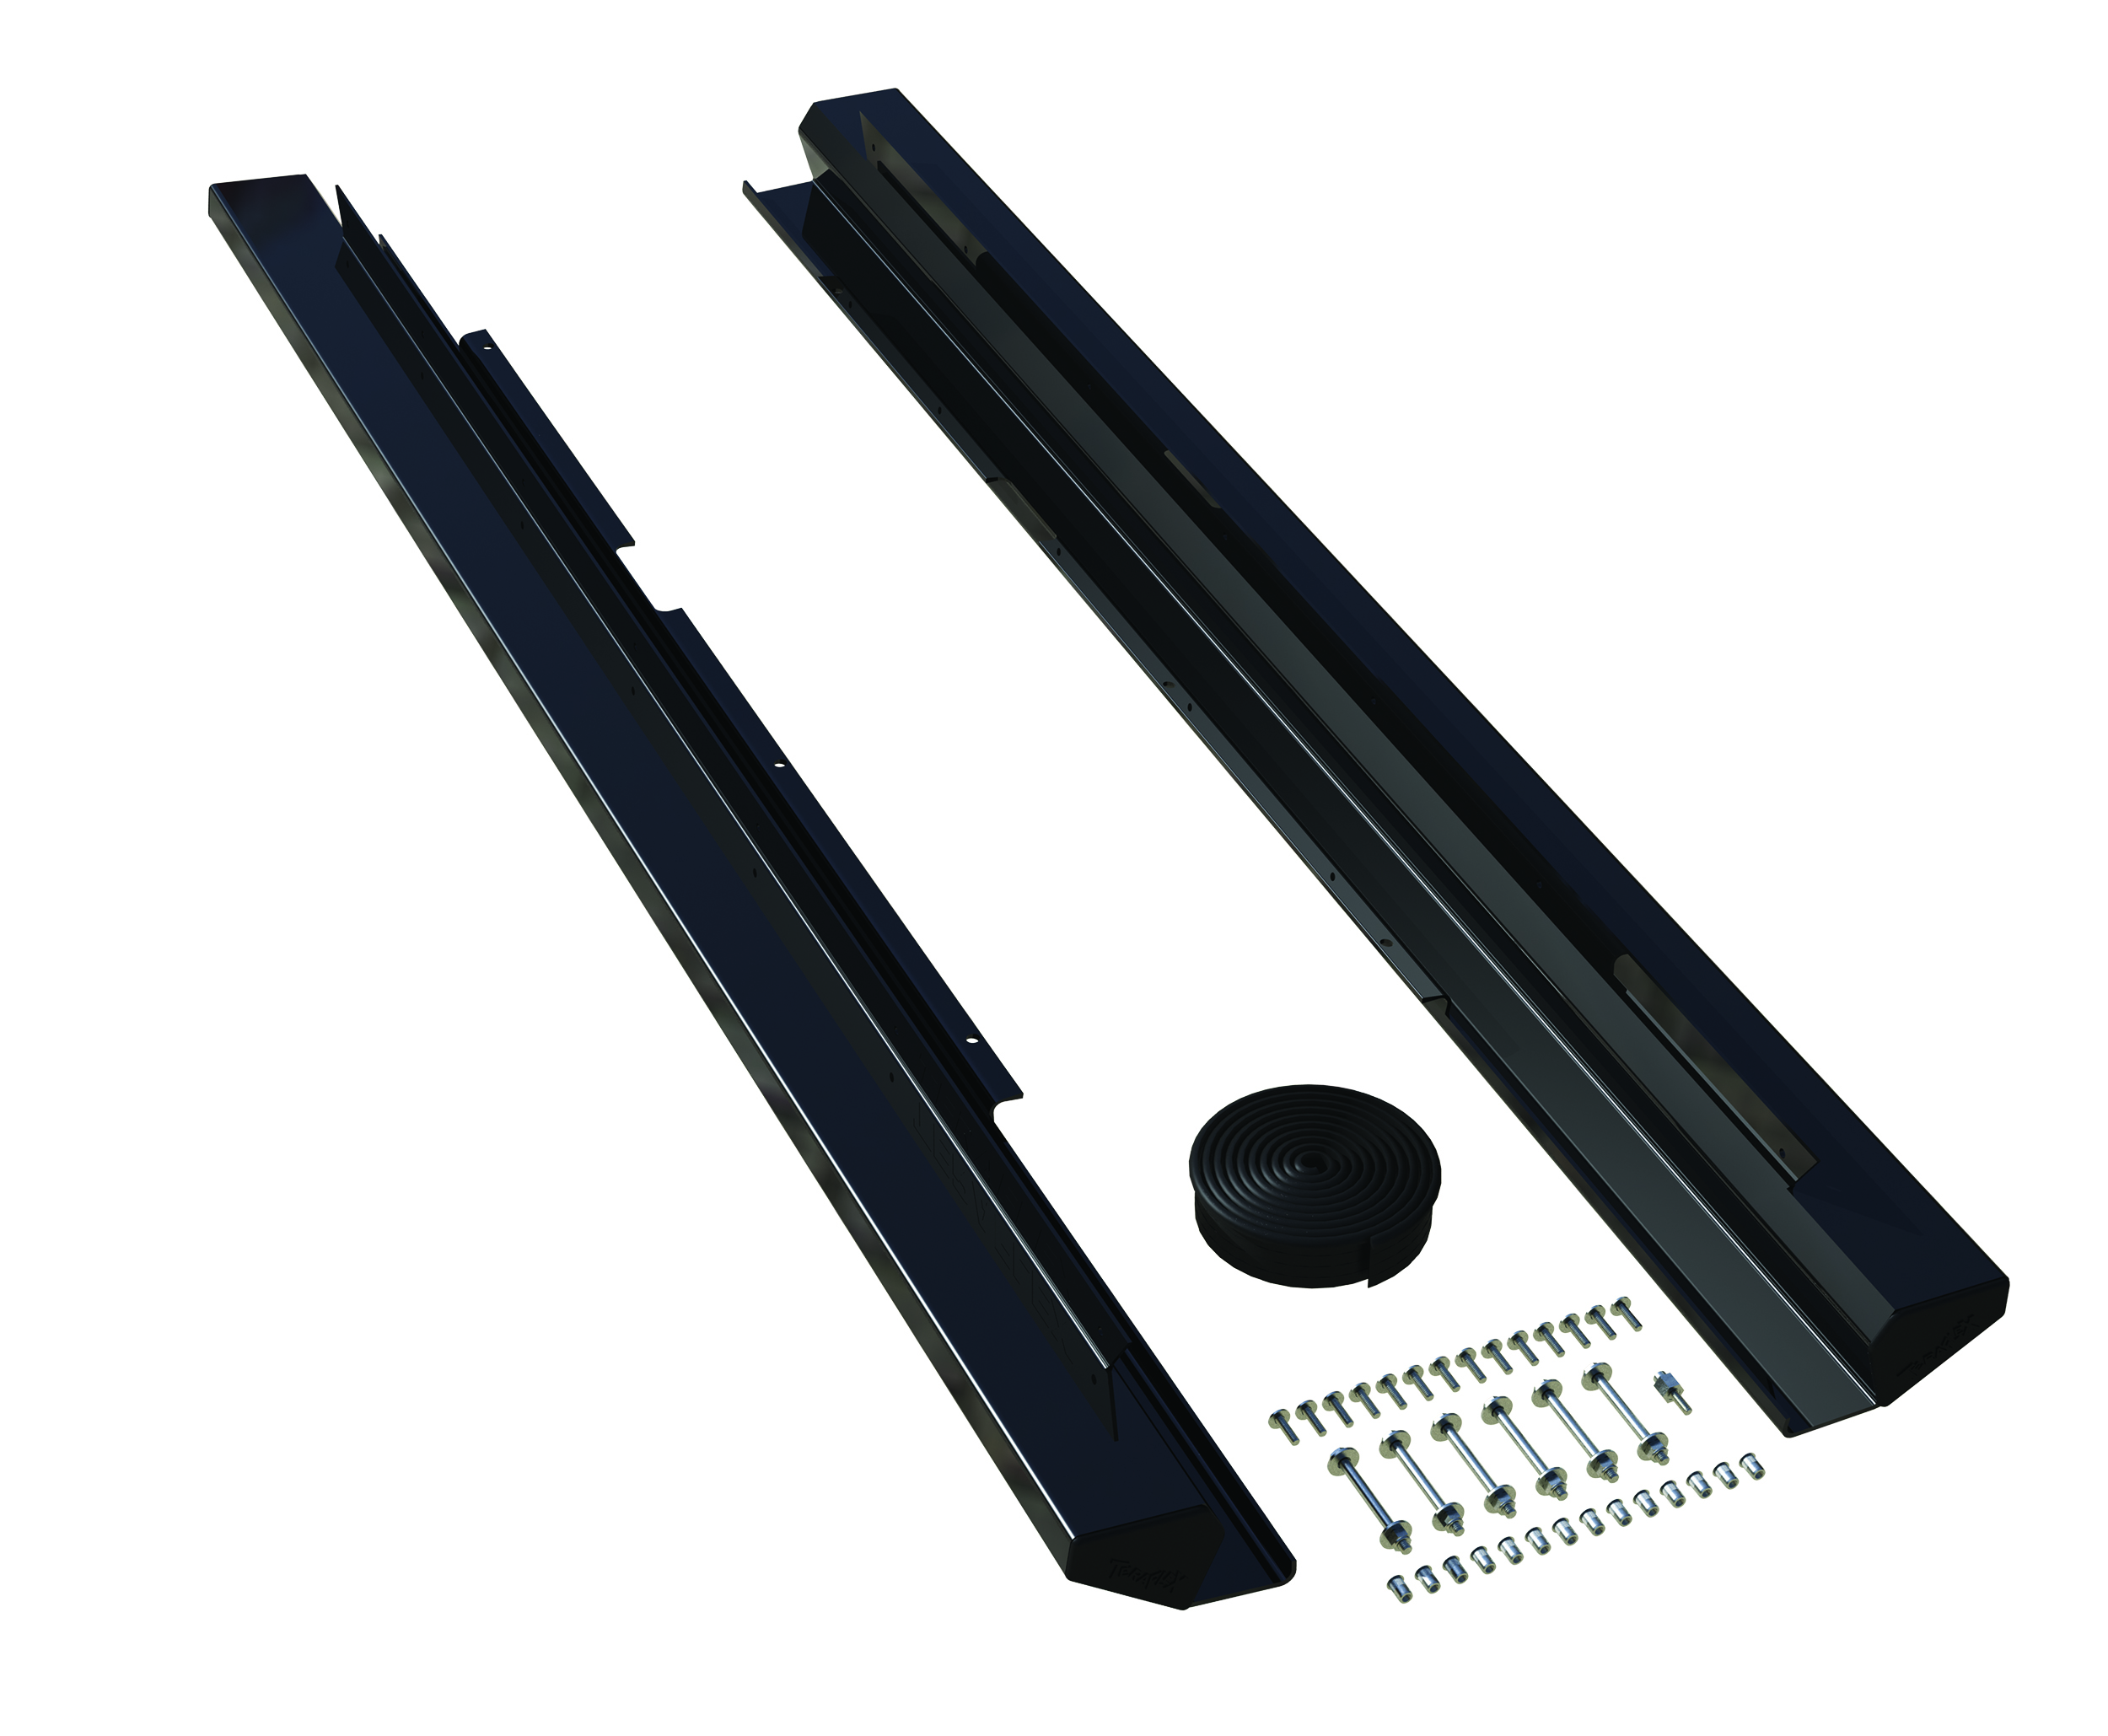 TeraFlex 4637310 JK 4 Door Rock Slider Kit